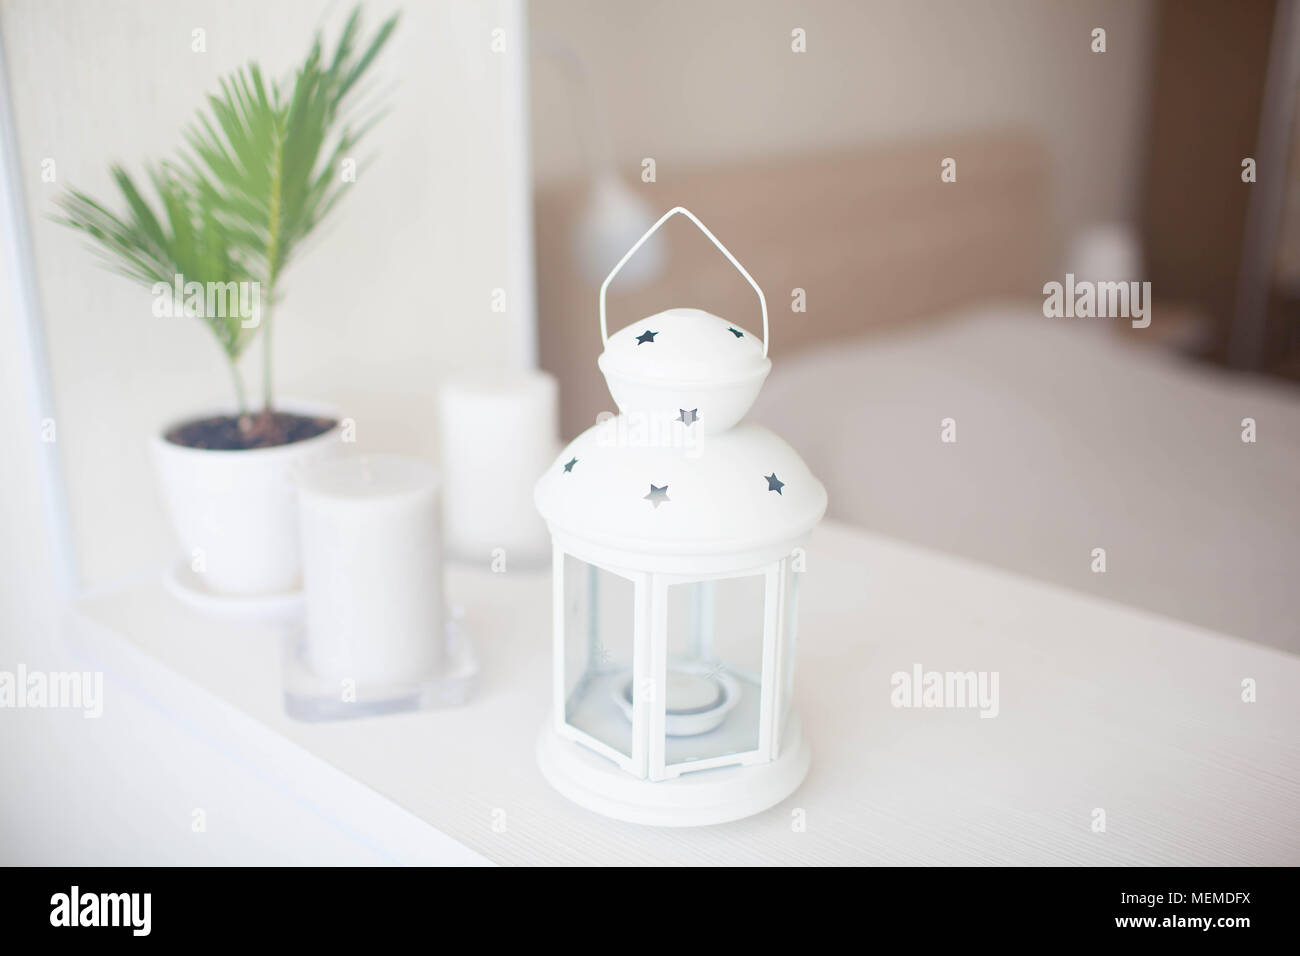 White lantern in the home interior - Stock Image